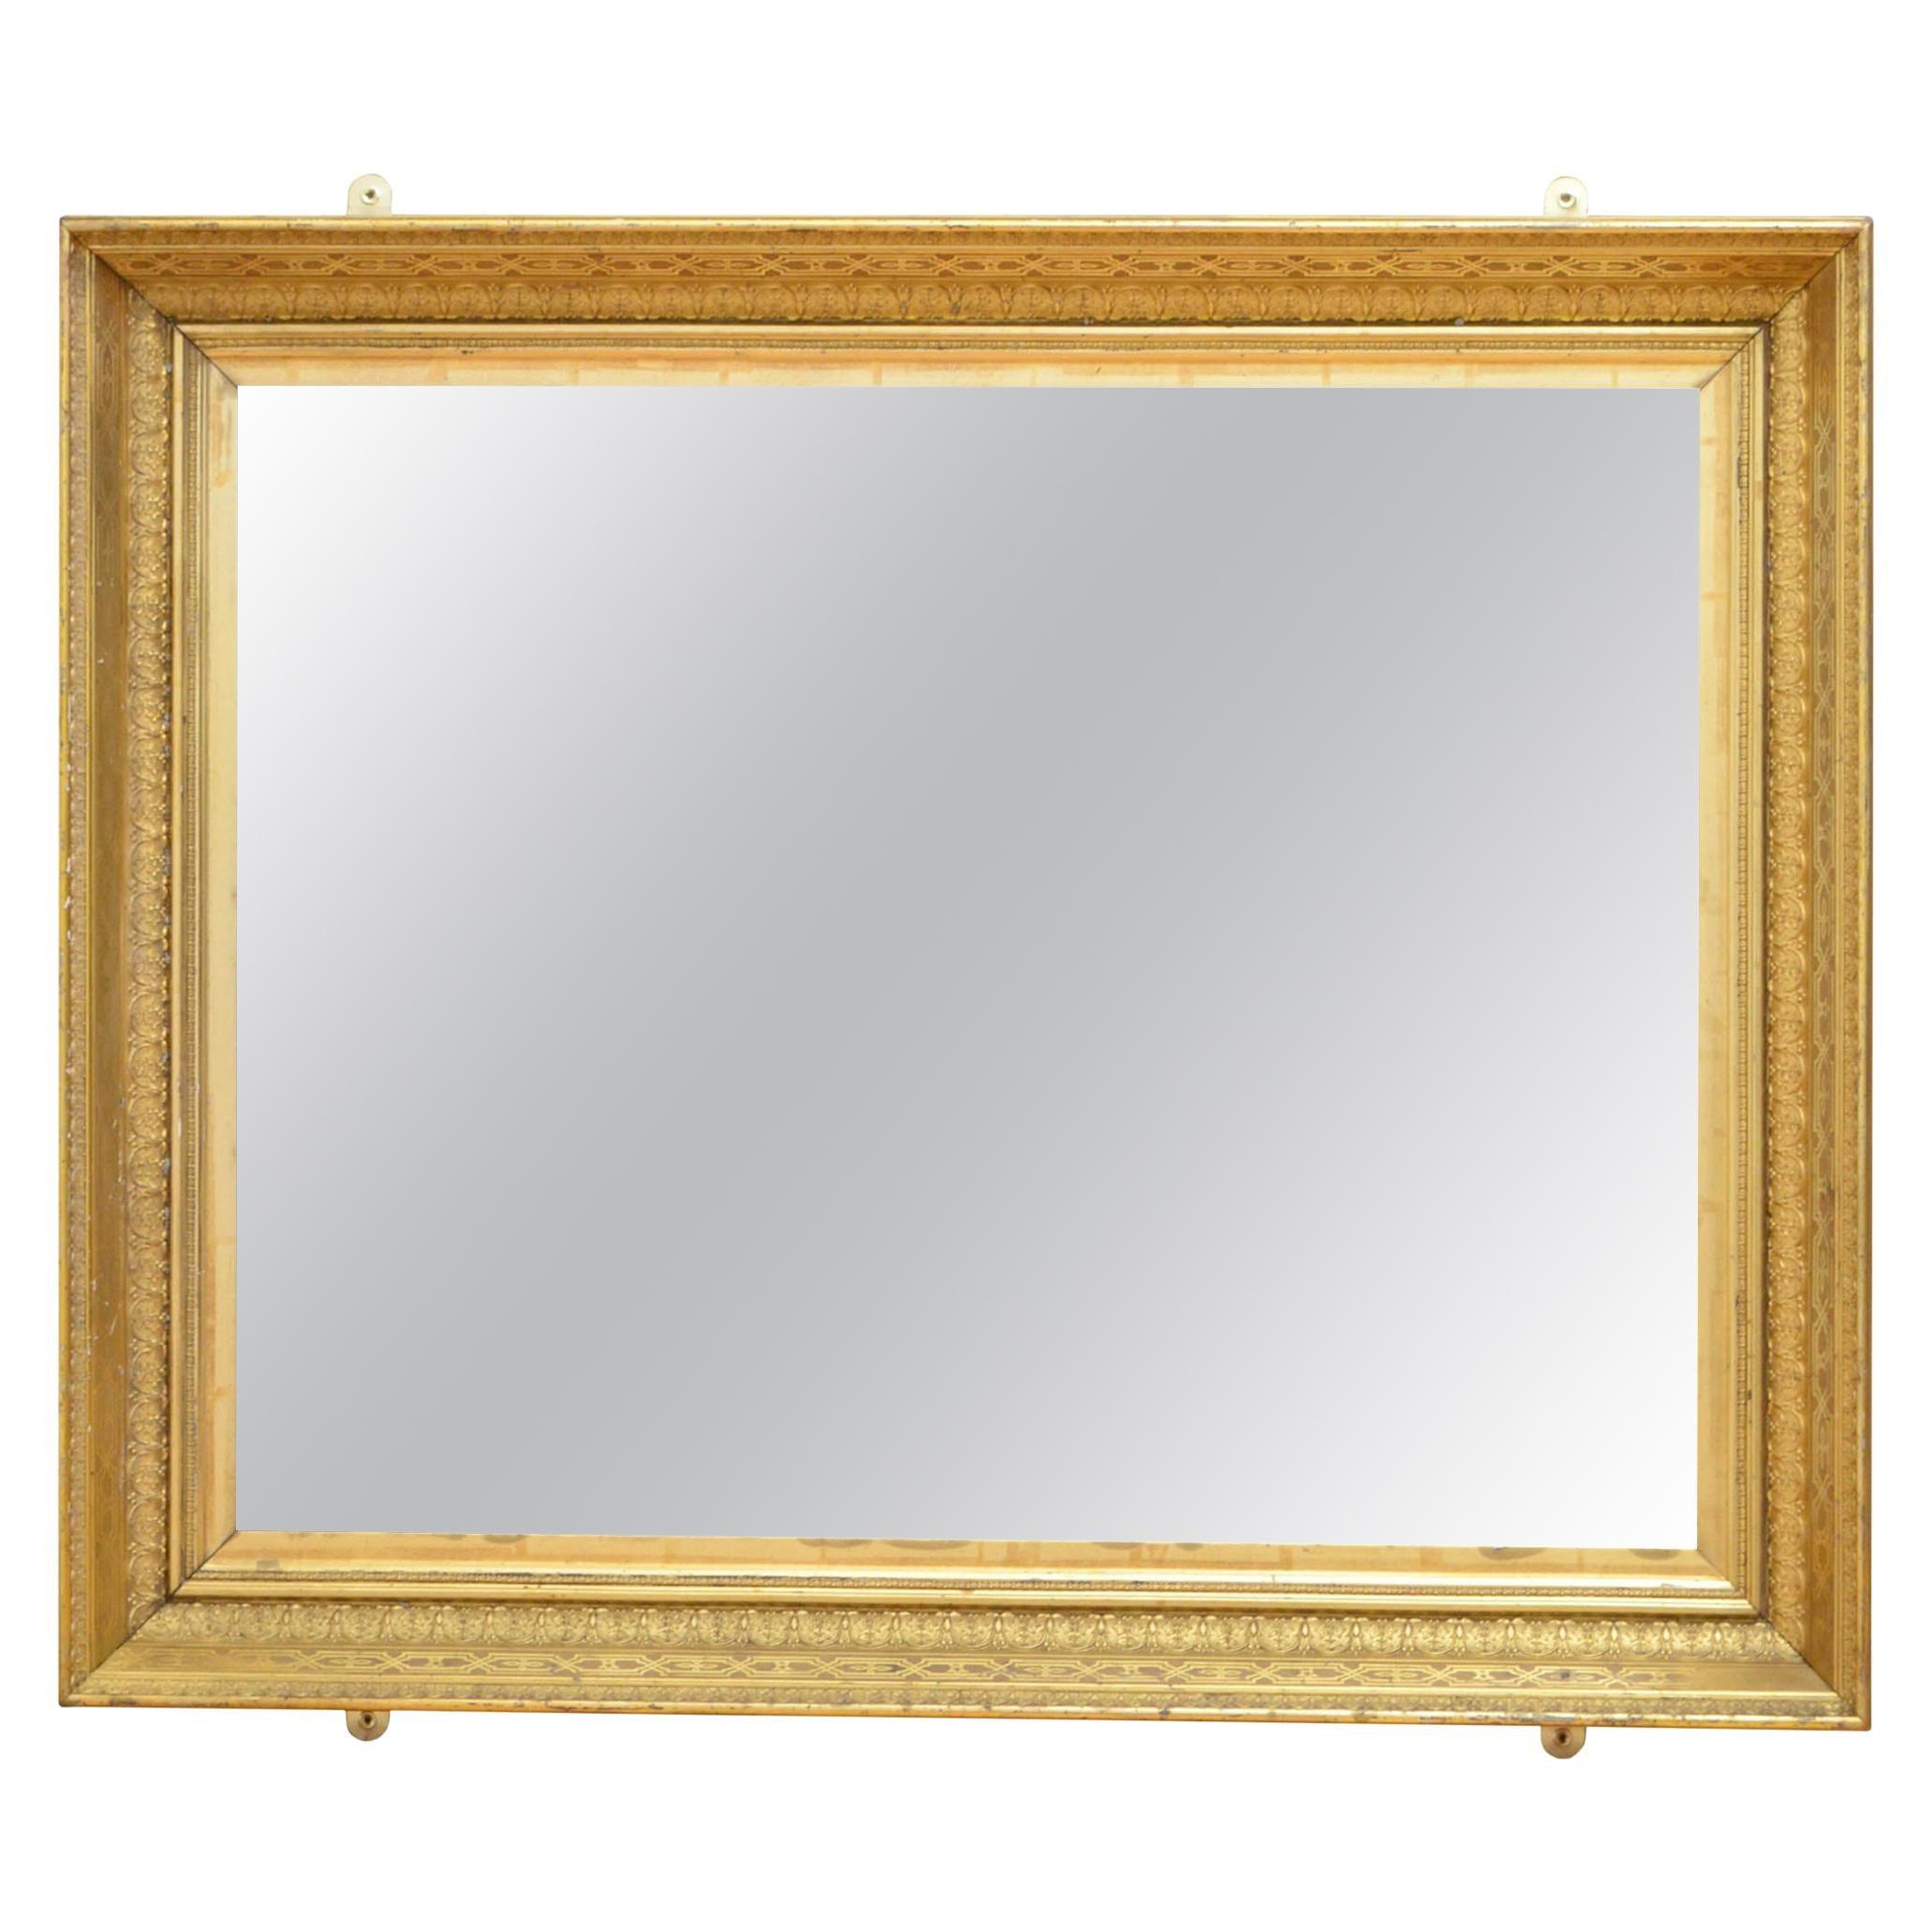 Superb French Giltwood Wall Mirror